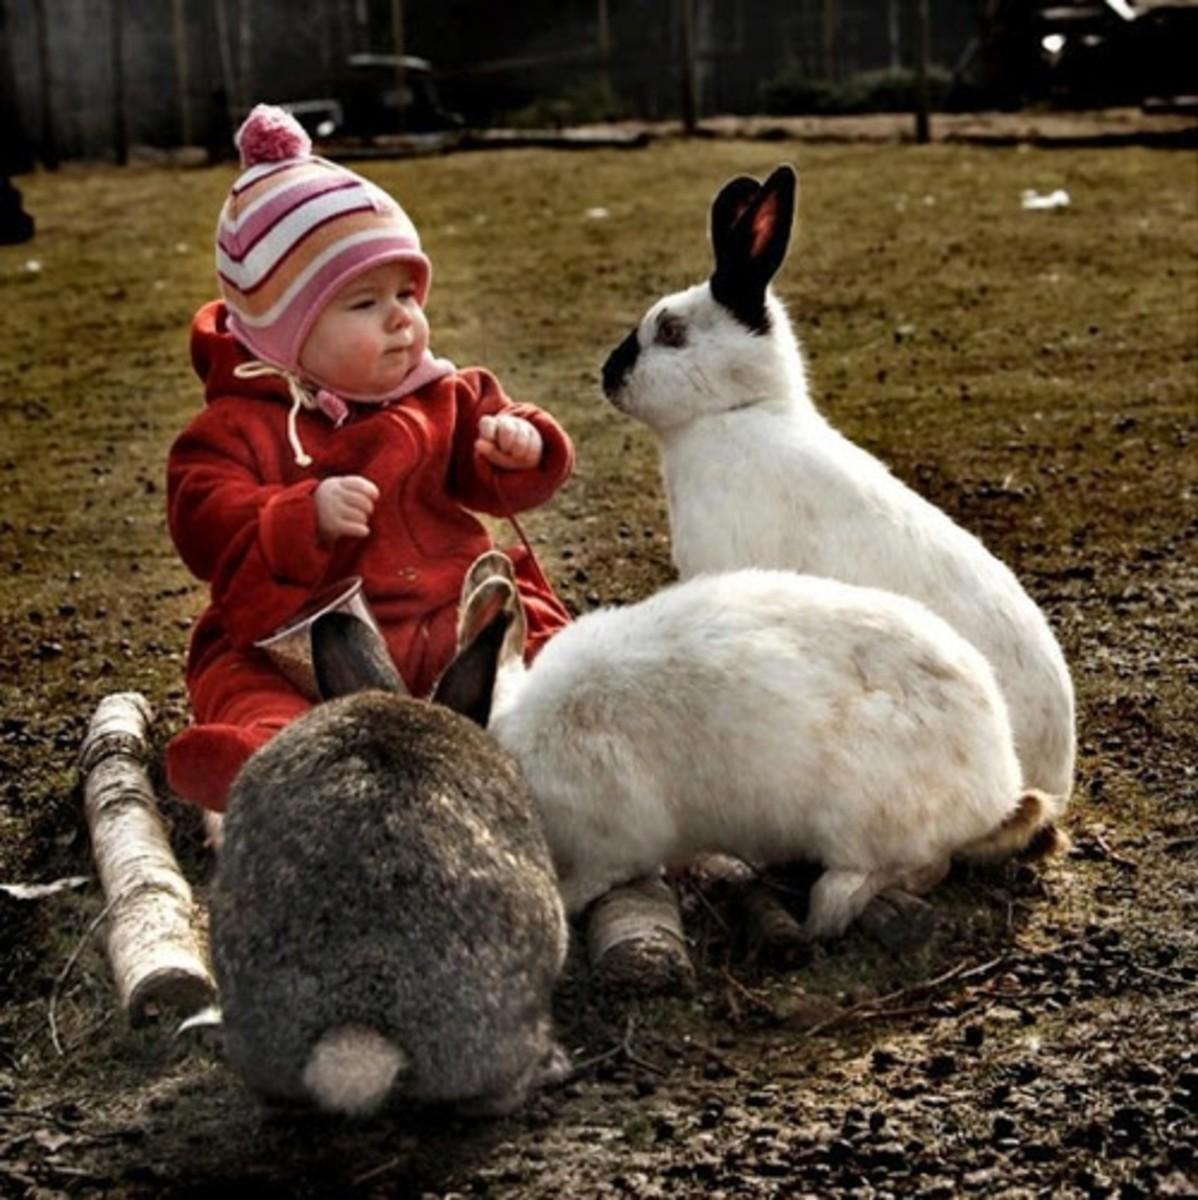 Cute baby and Himalayan Rabbit.